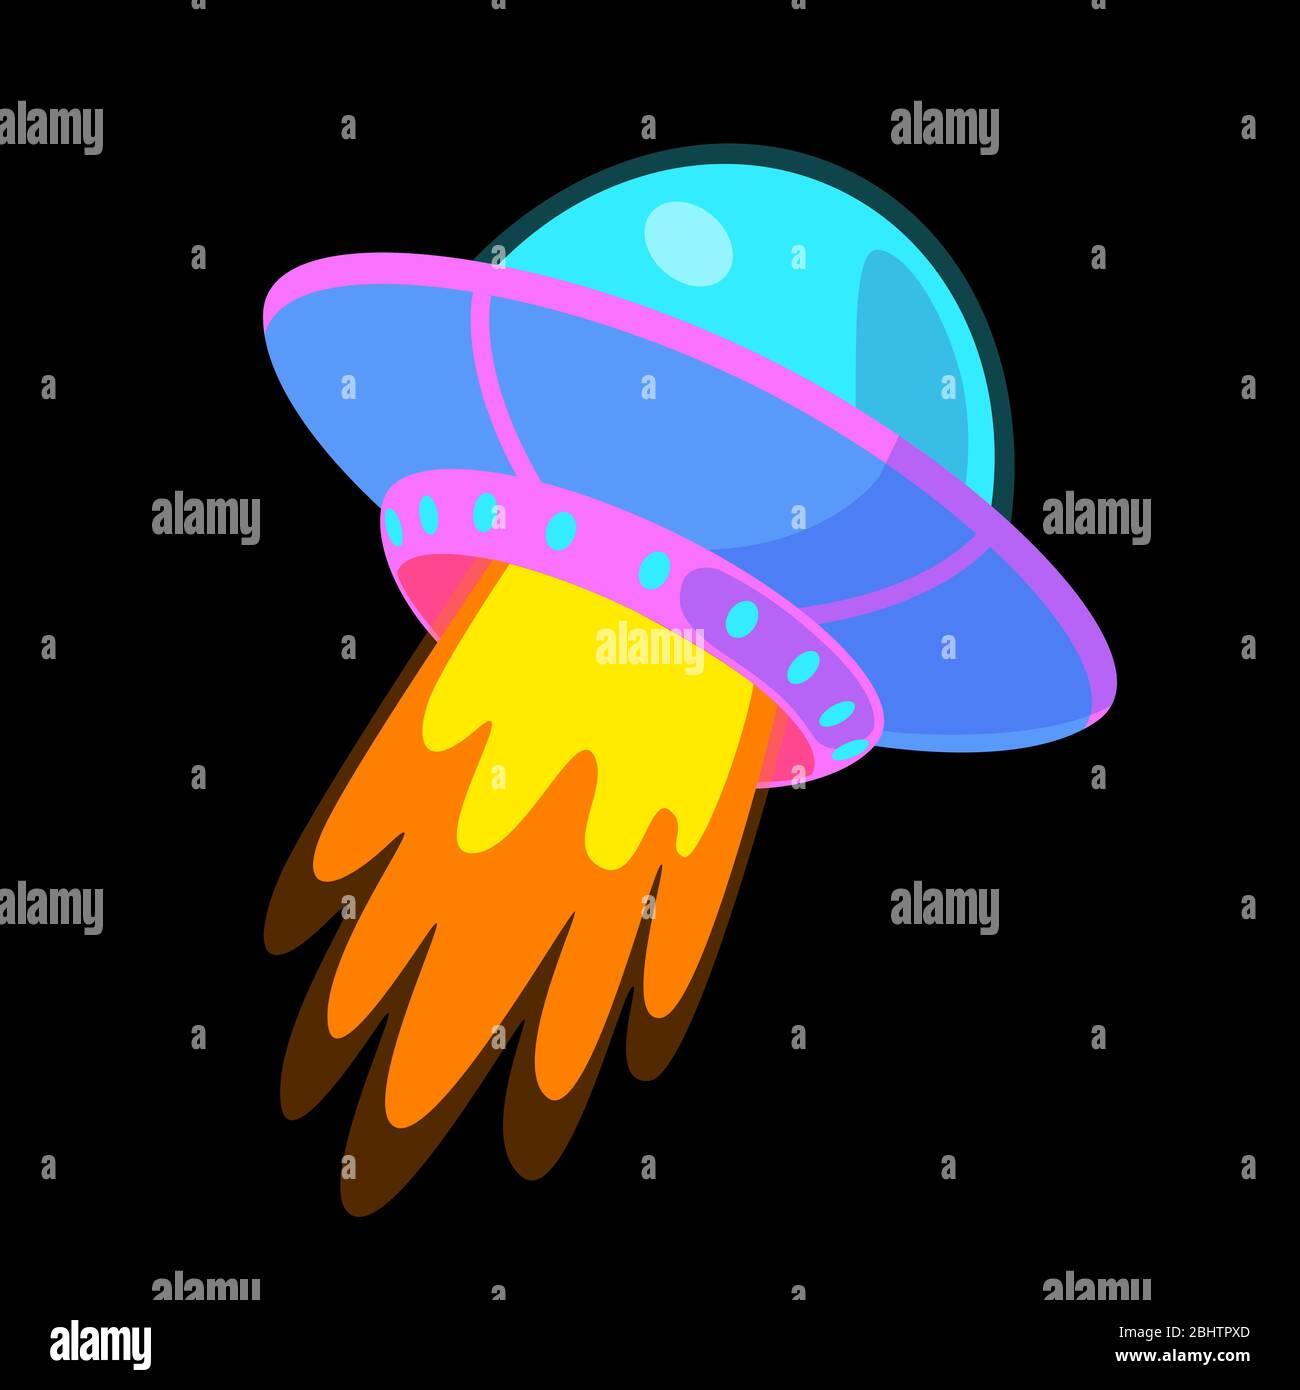 Fantasy Flying Saucer Cartoon Sticker Ufo Vector Color Illustration Childish Spaceship Isolated On Black Background Alien Ship Design Element Cosmic Kid Clip Art Stock Vector Image Art Alamy